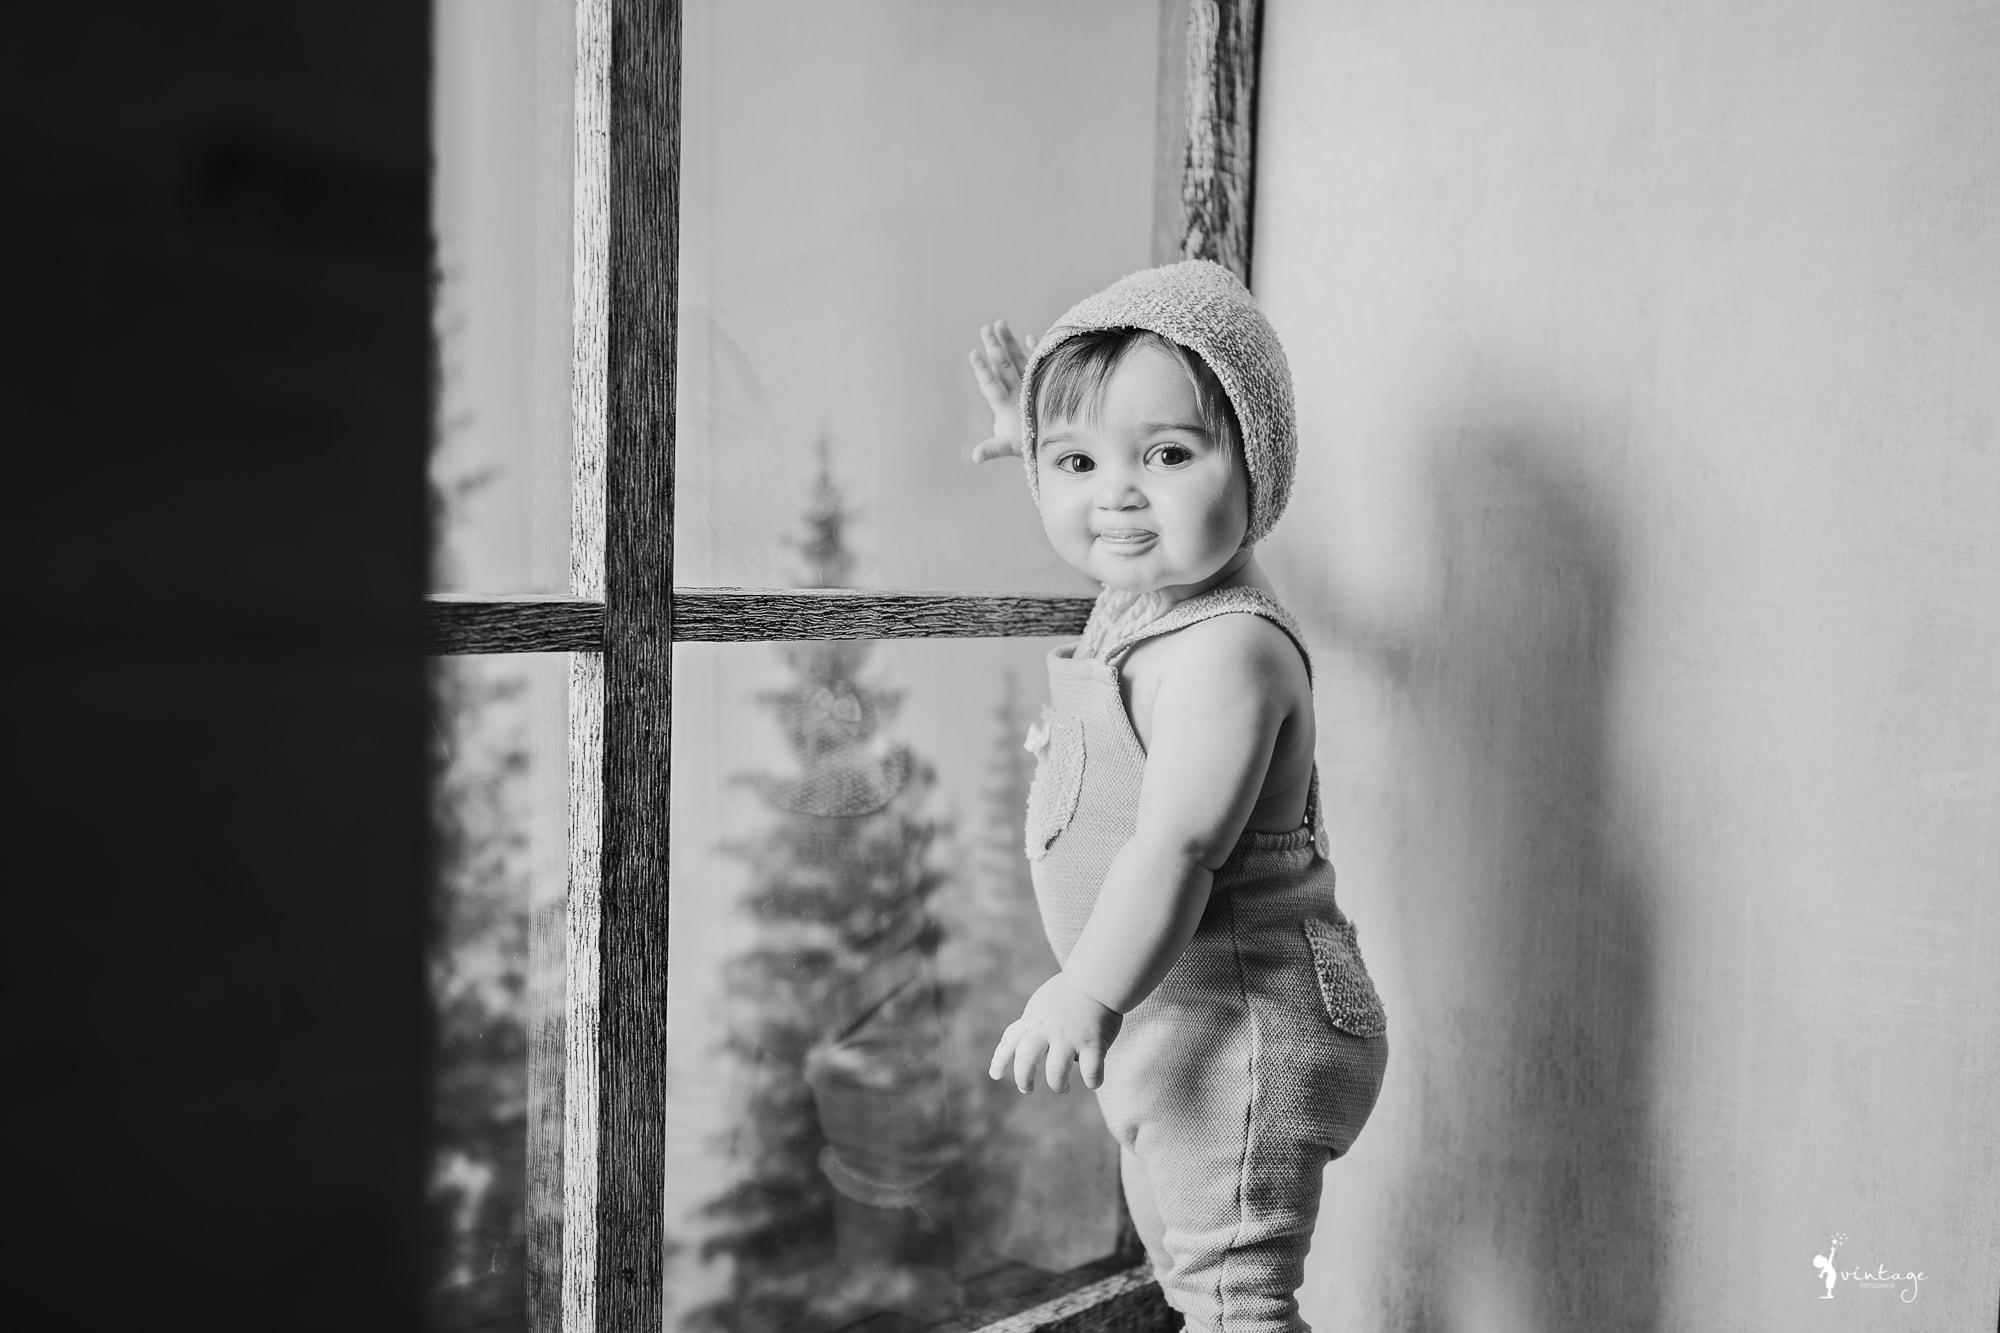 reportaje infantil book en estudio valencia vintage fotografia toni lara